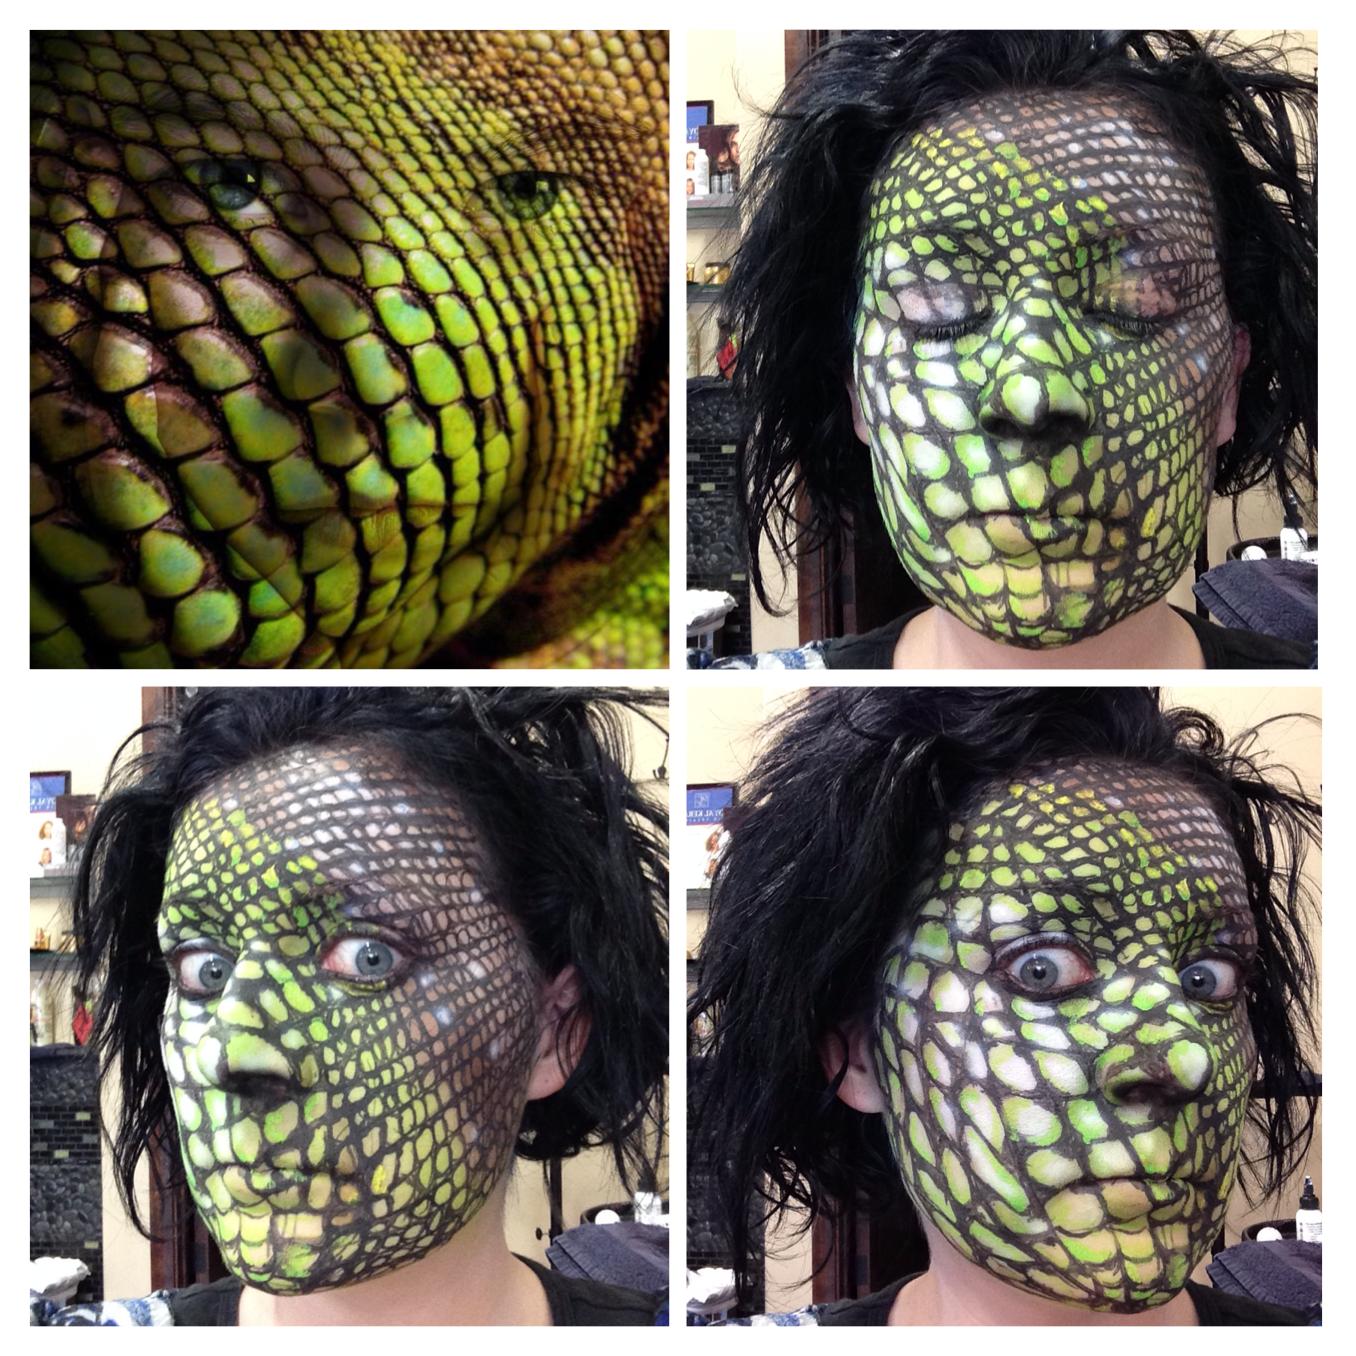 Lizard skin makeup | Fantasy & Halloween Airbrush Makeup ...